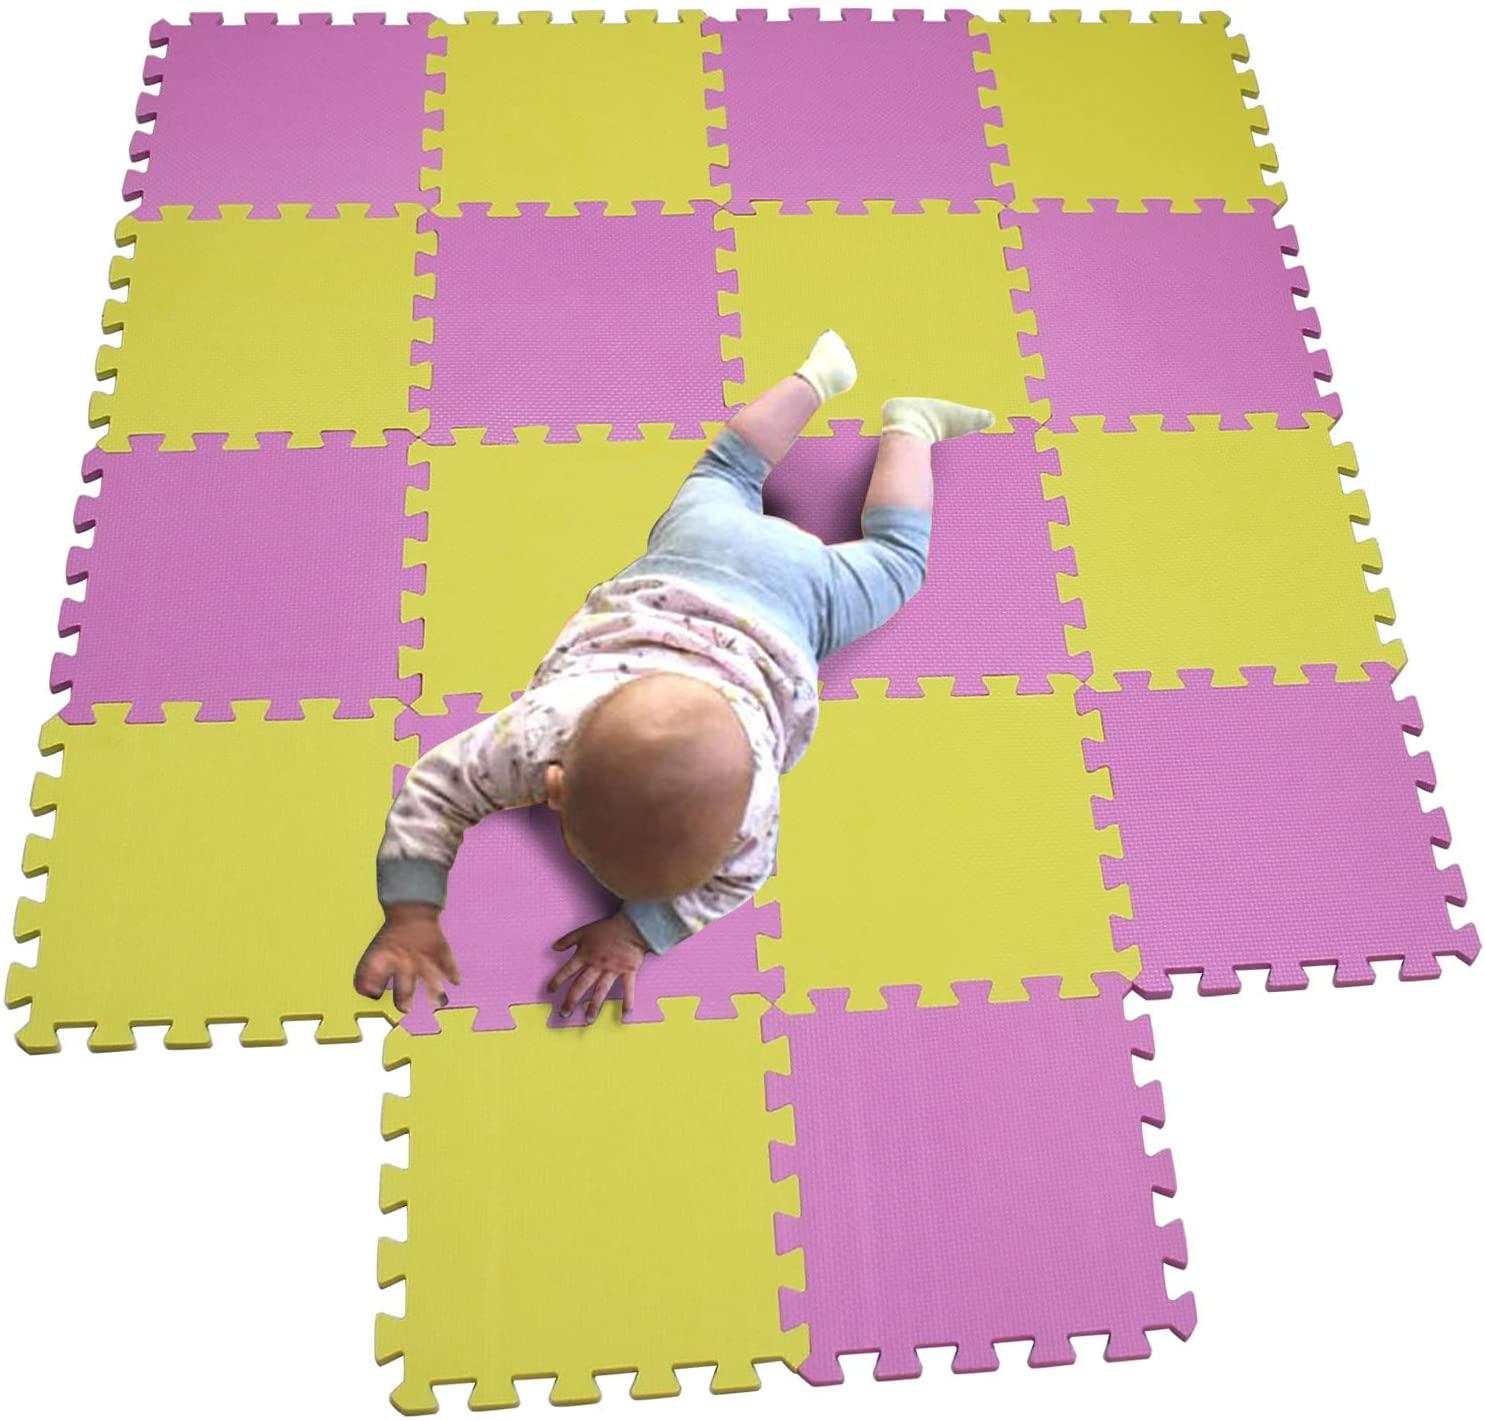 MQIAOHAM Children Puzzle mat Play mat Squares Play mat Tiles Baby mats for Floor Puzzle mat Soft Play mats Girl playmat Carpet Interlocking Foam Floor mats for Baby Pink Yellow 103105